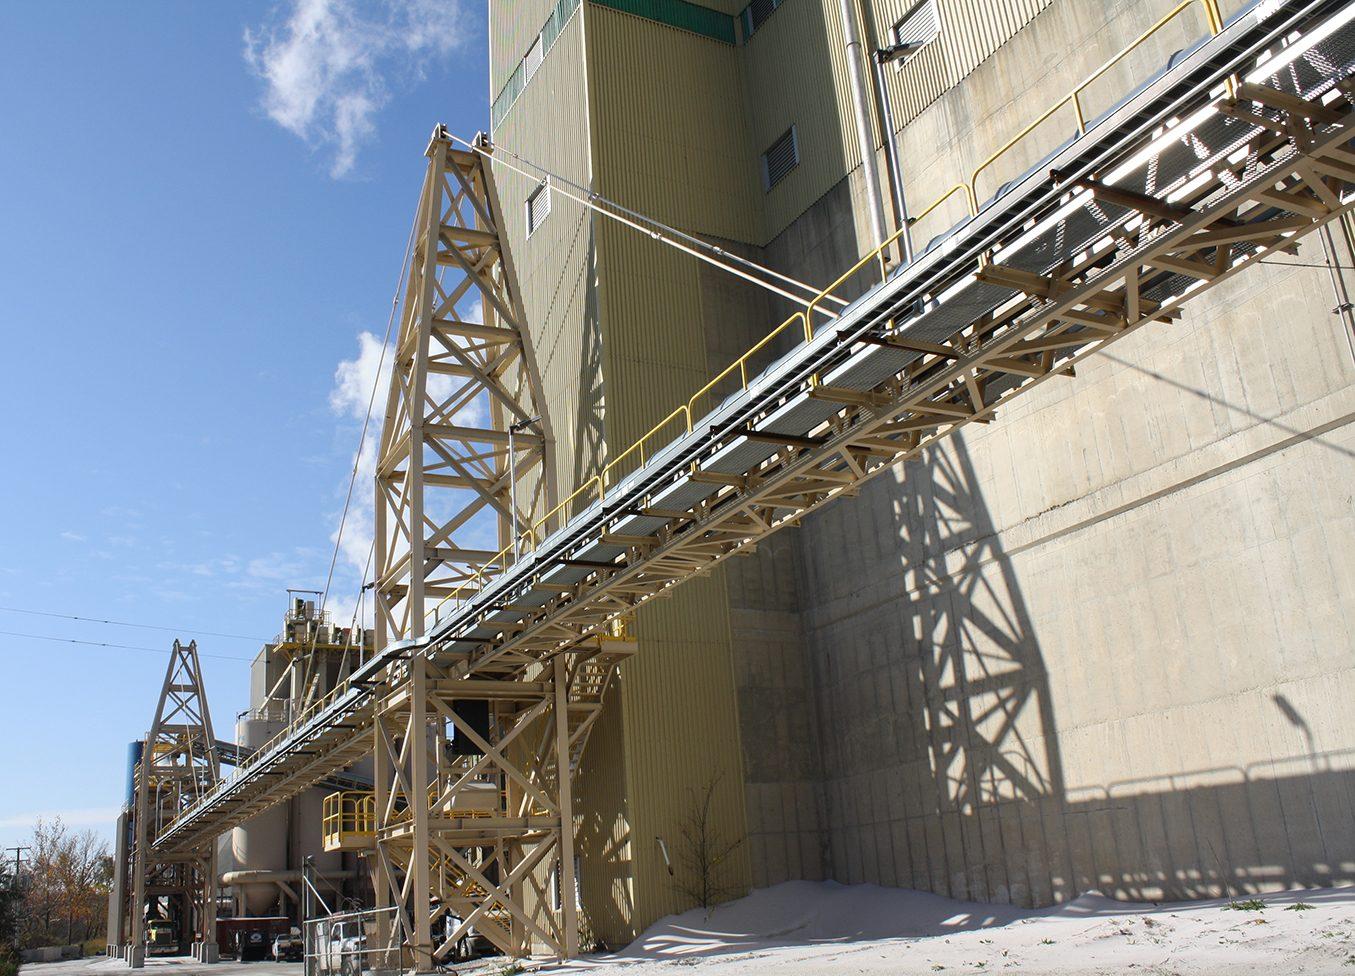 Fairmount Minerals Suspension Truss Conveyor